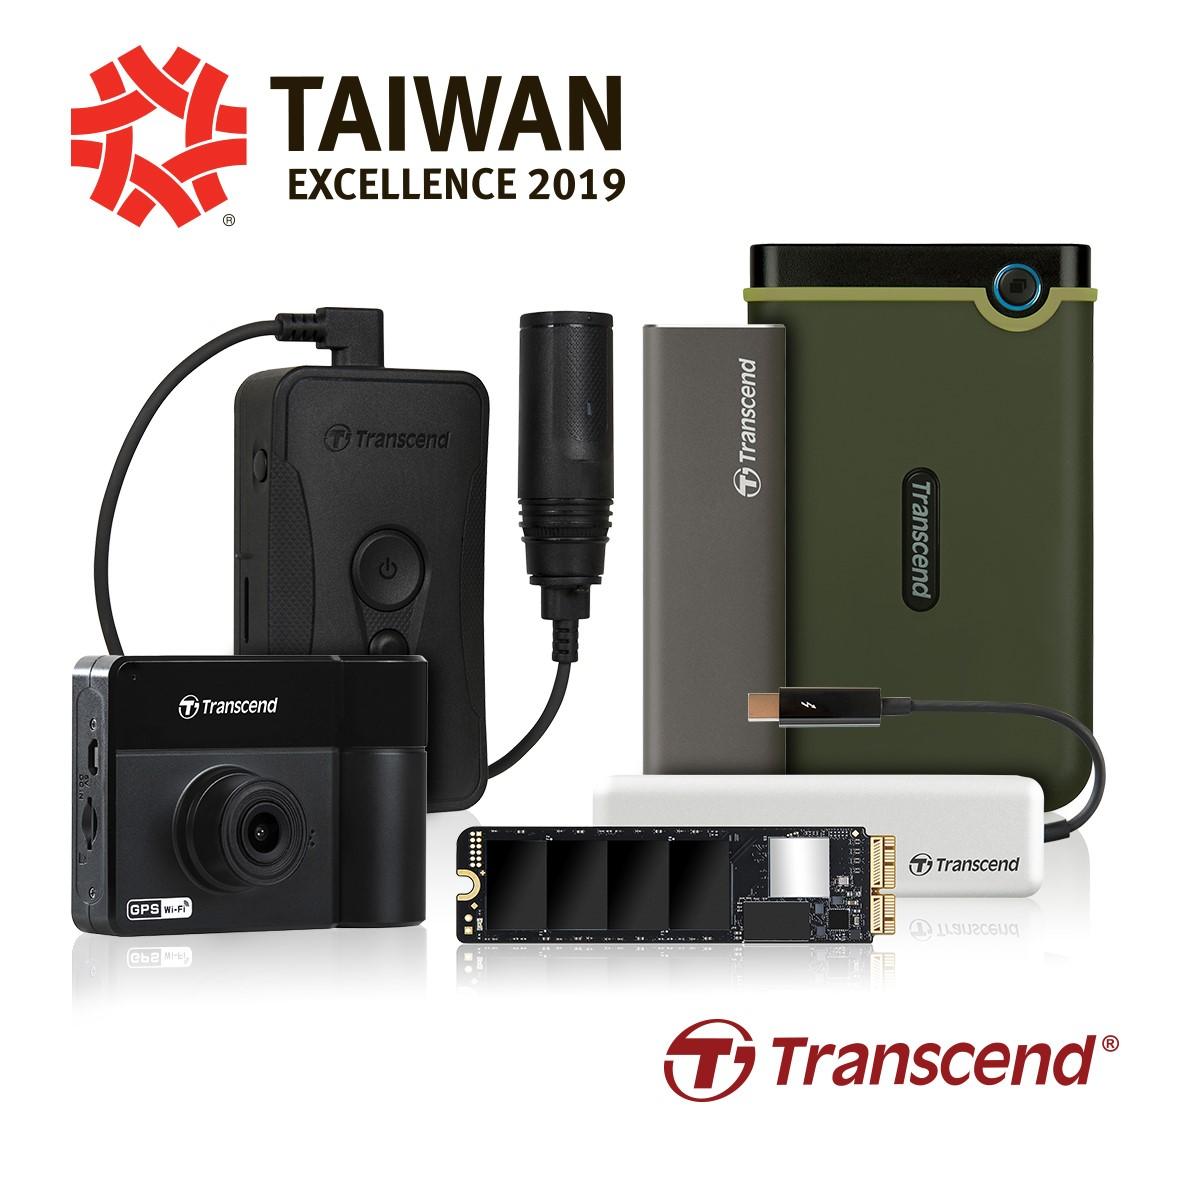 Transcend กวาด 5 รางวัลจาก Taiwan Excellence Award 2019